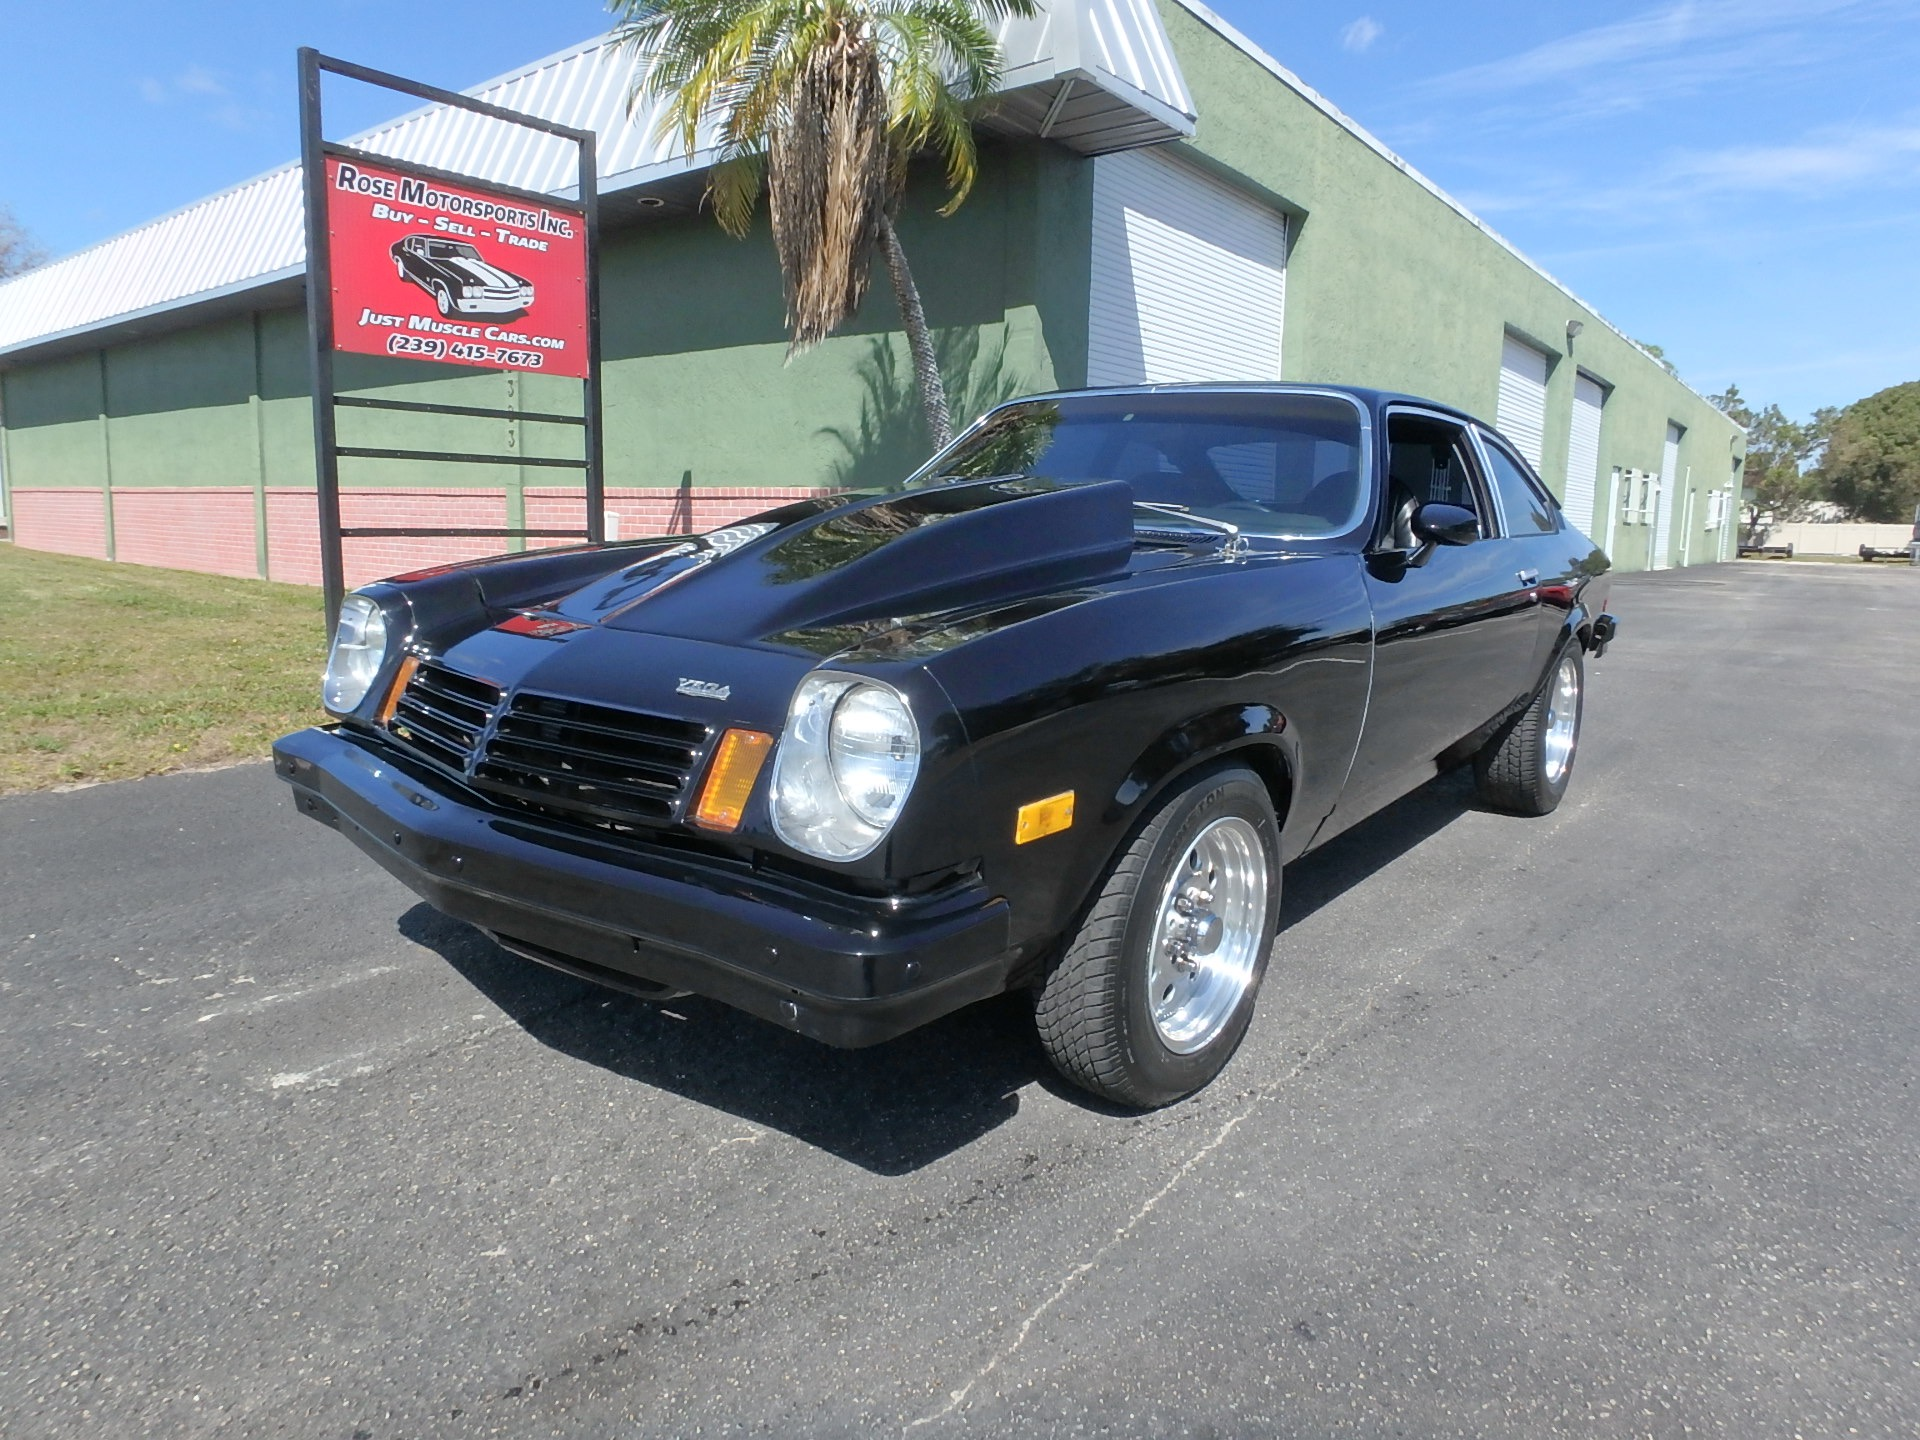 Used 1974 Chevy Vega